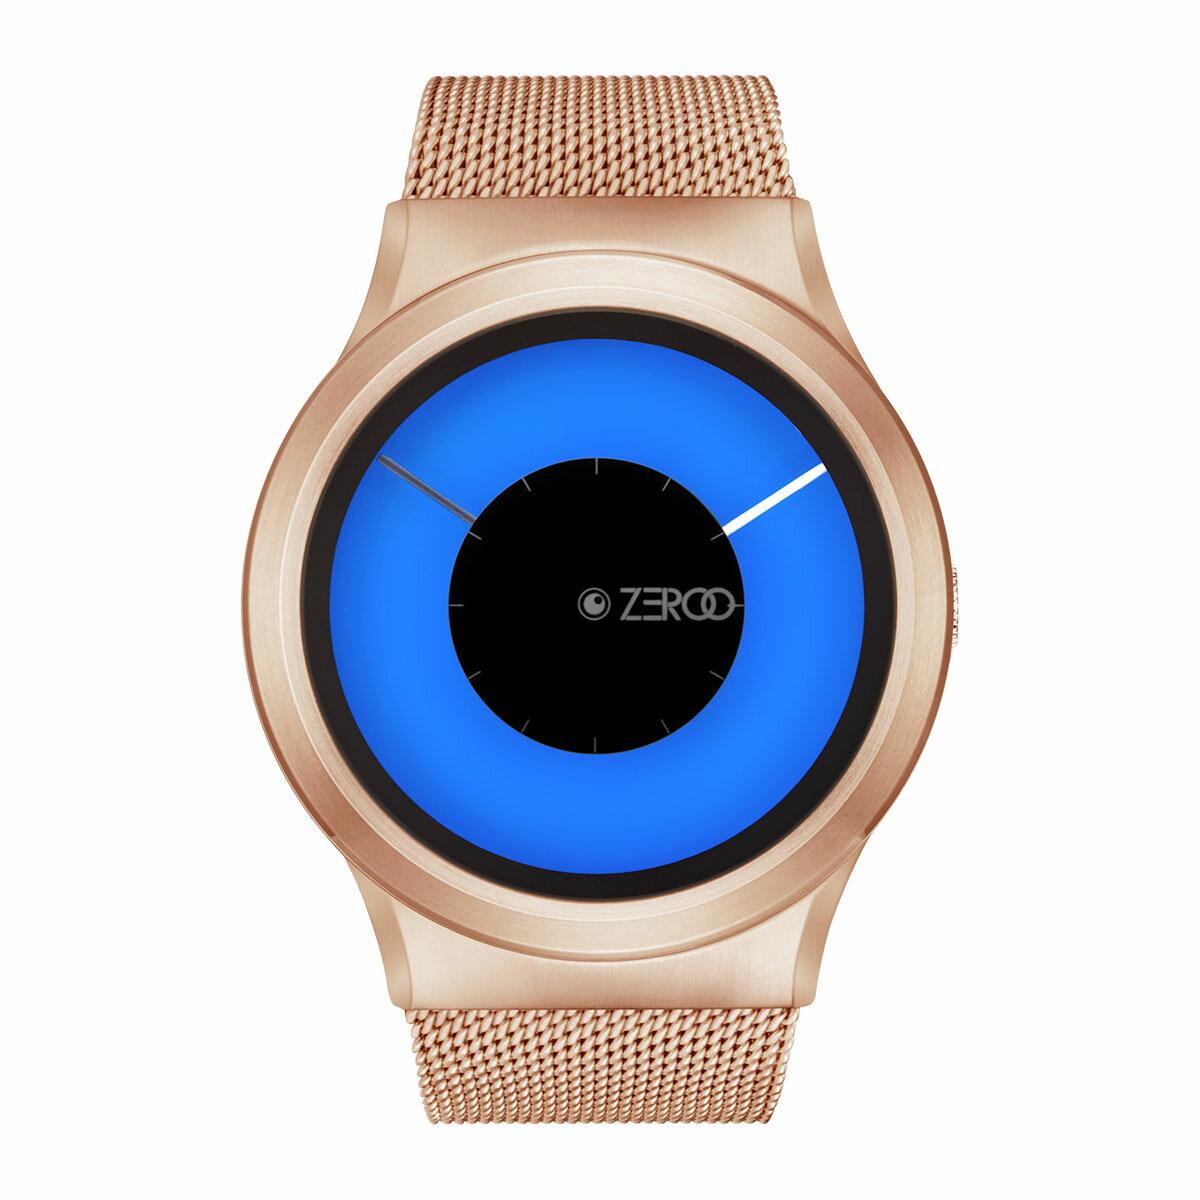 ZEROO MAGIA AURORA ゼロ 電池式クォーツ 腕時計 [W11026B05SM05] ブルー デザインウォッチ ペア用 メンズ レディース ユニセックス おしゃれ時計 デザイナーズ